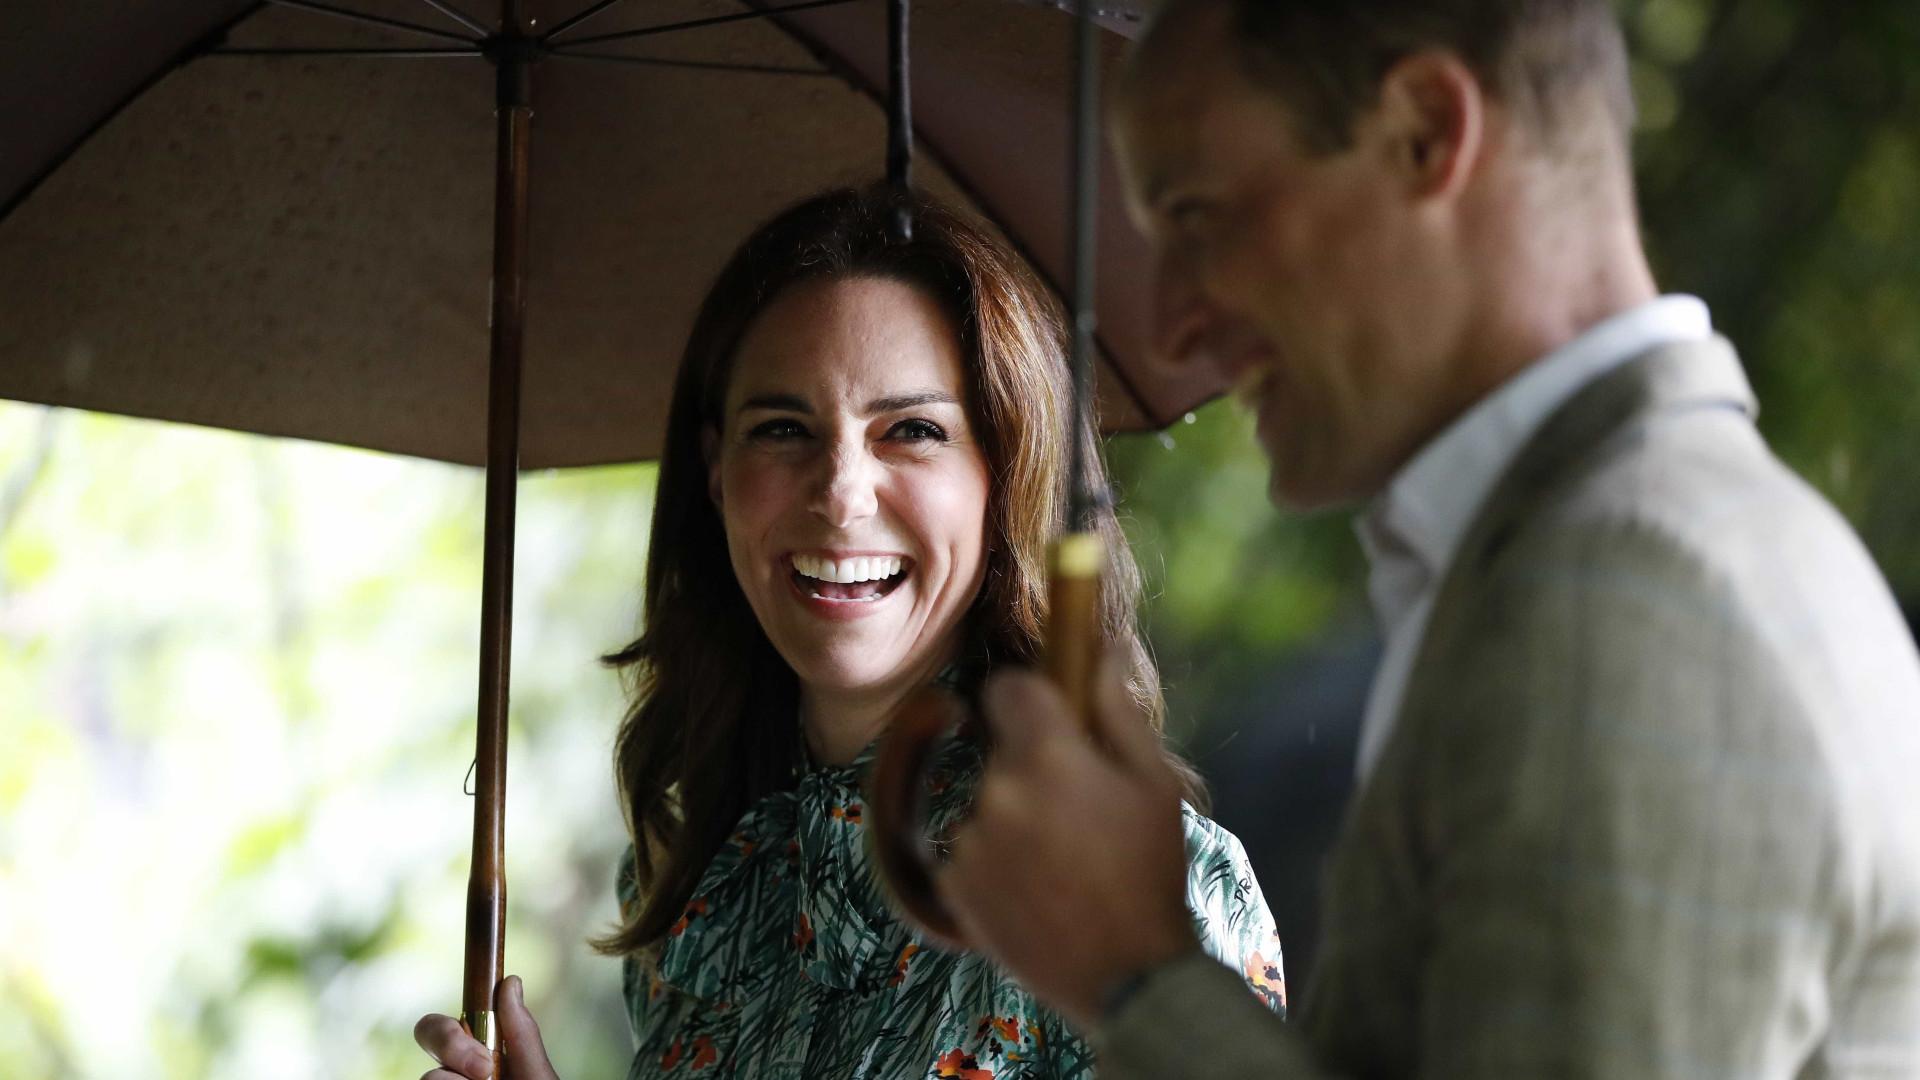 Príncipe William fala sobre gravidez de Kate Middleton